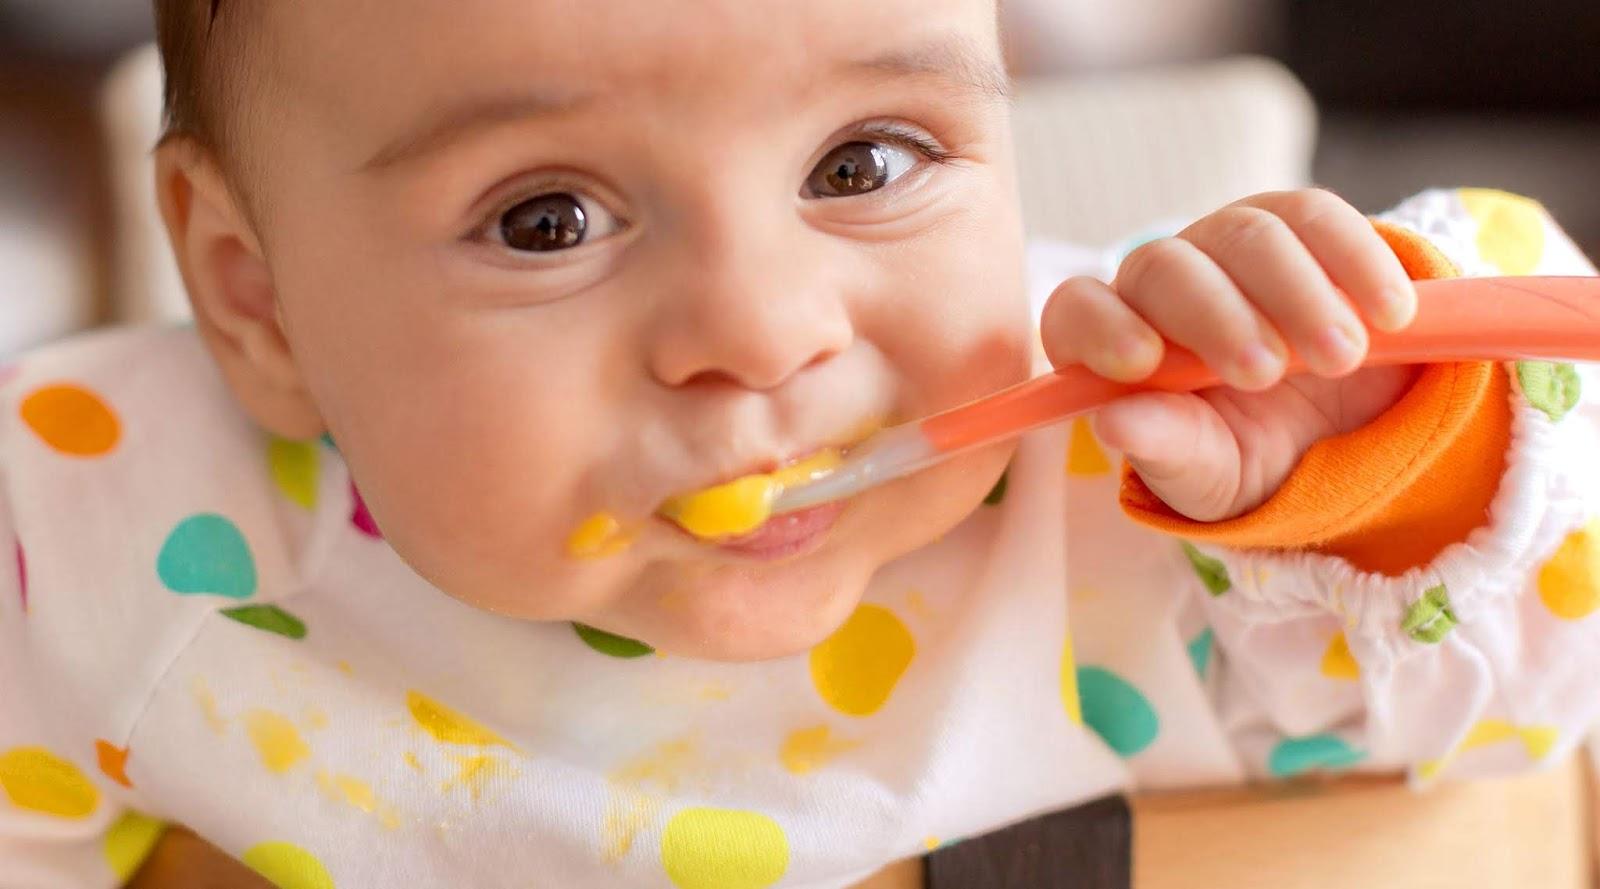 topcastingcalls: Open Casting Call for Babies 2018 Gerber